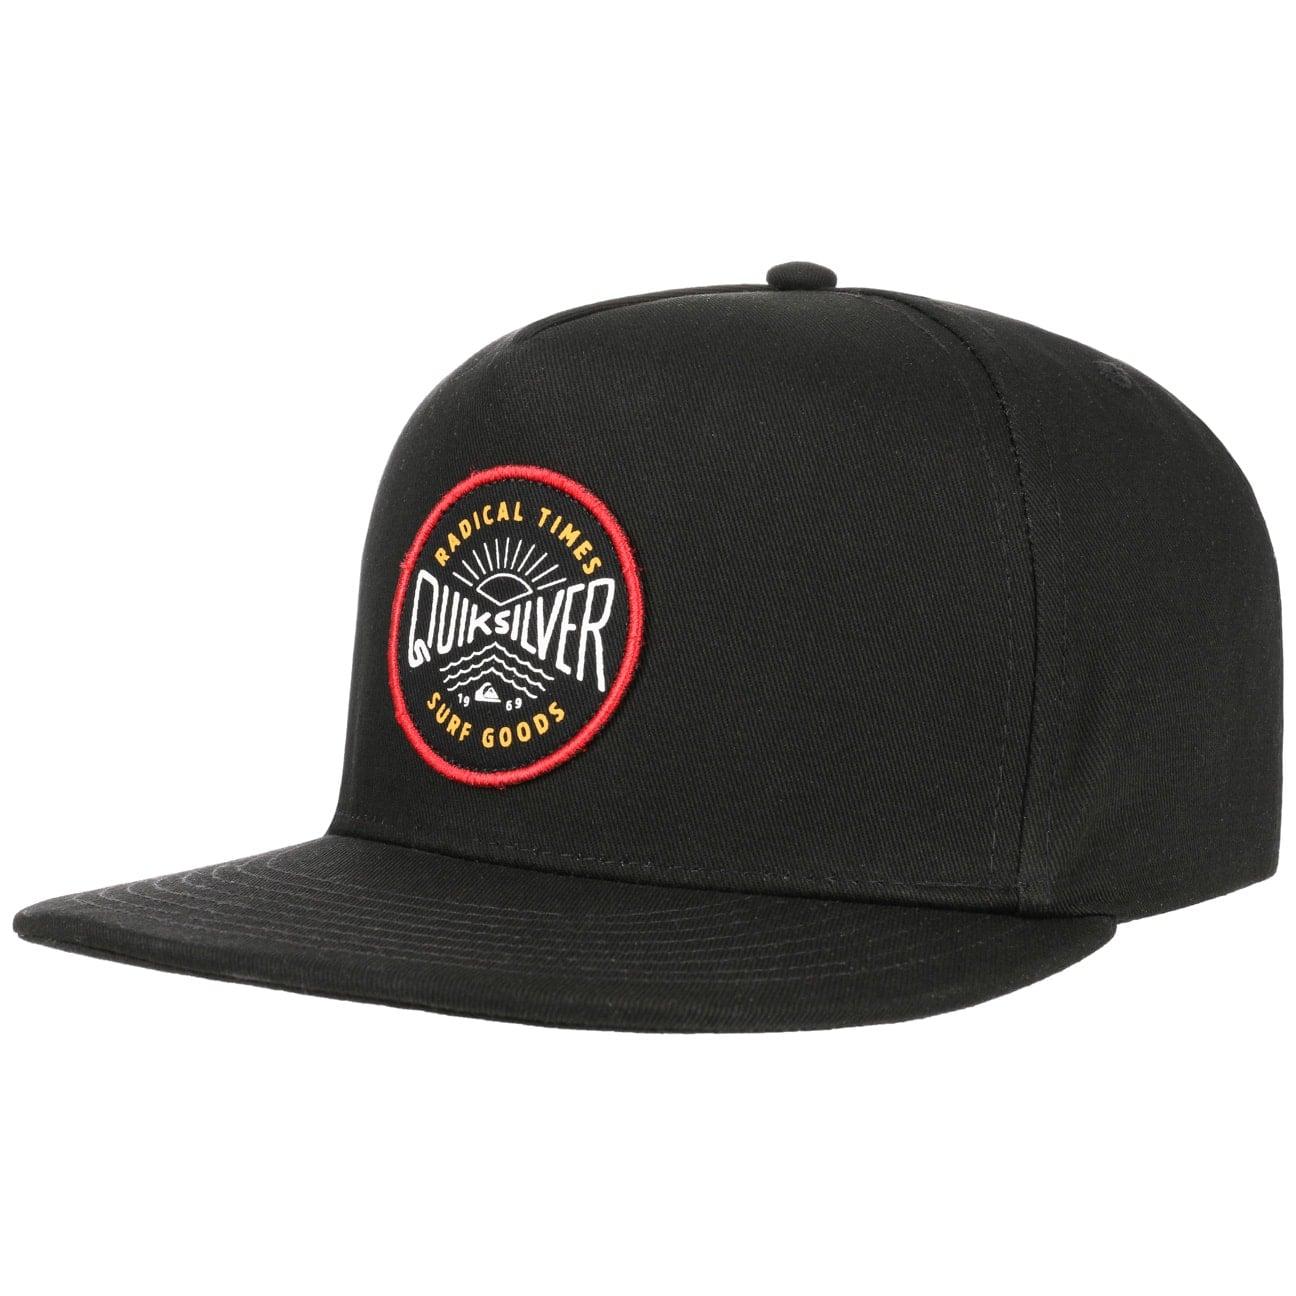 Gorra Mouthy Snapback by Quiksilver  gorra de baseball